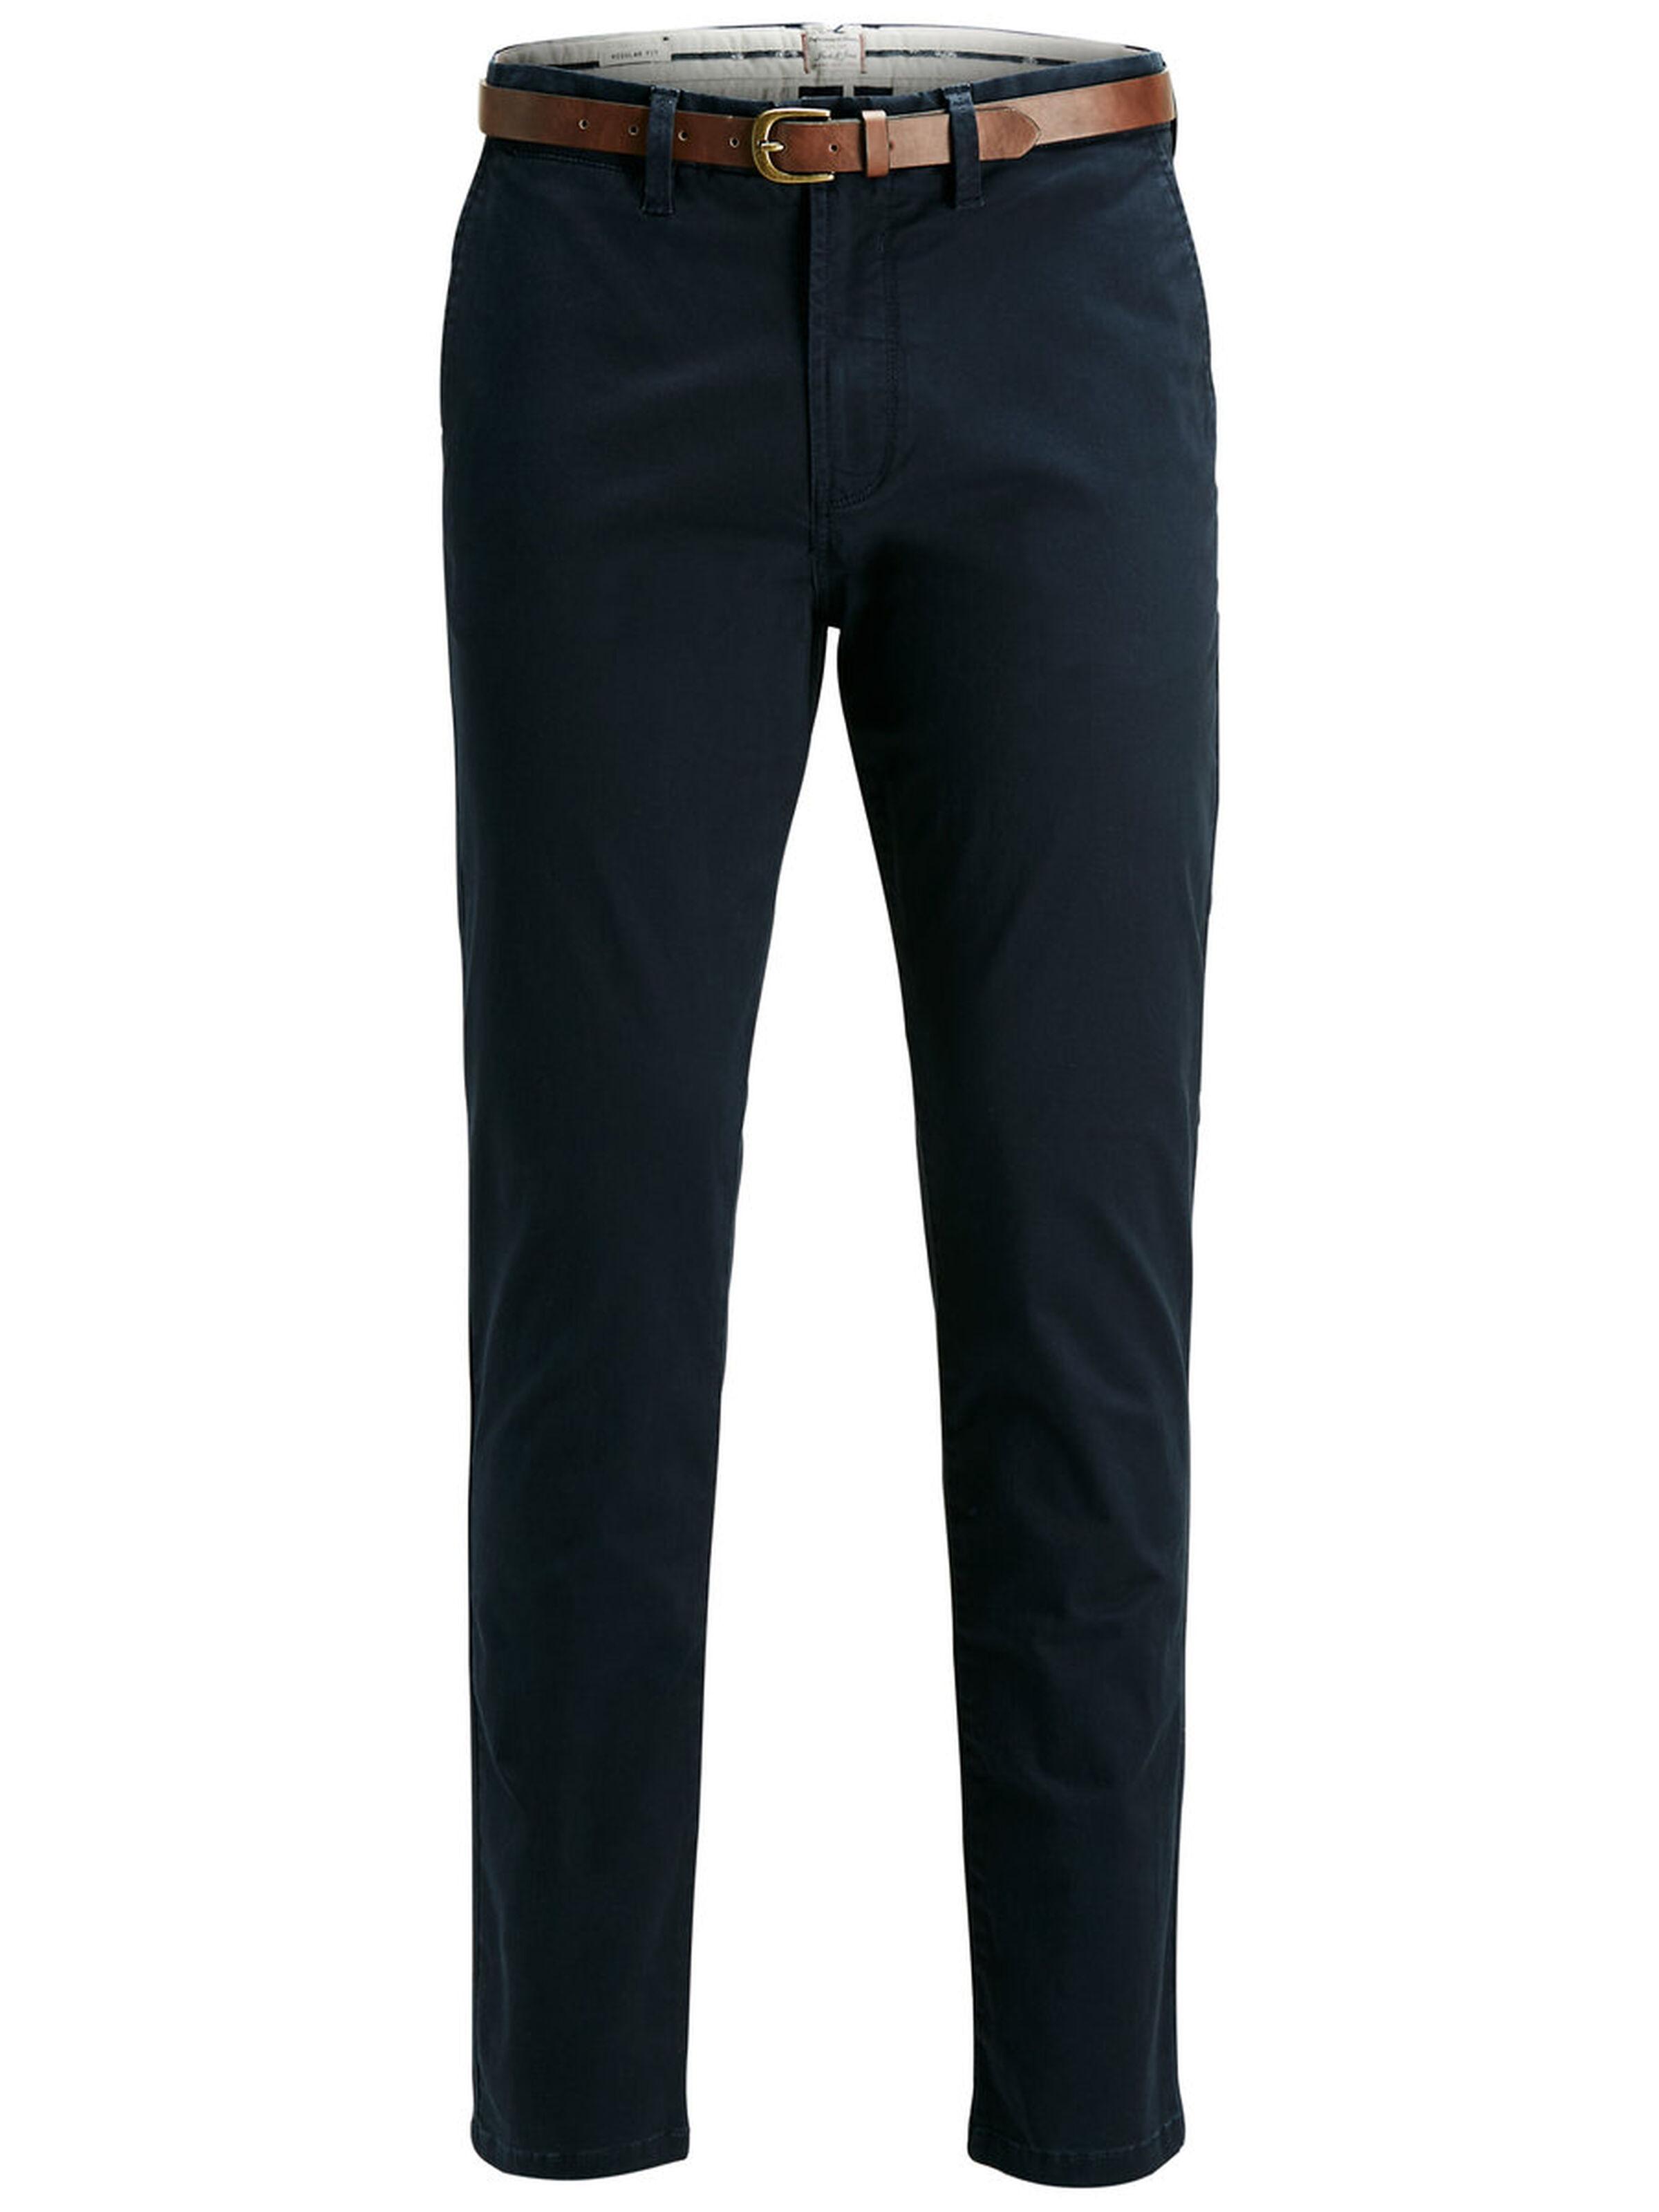 Pantaloni Jack & Jones Casual (3302) photo